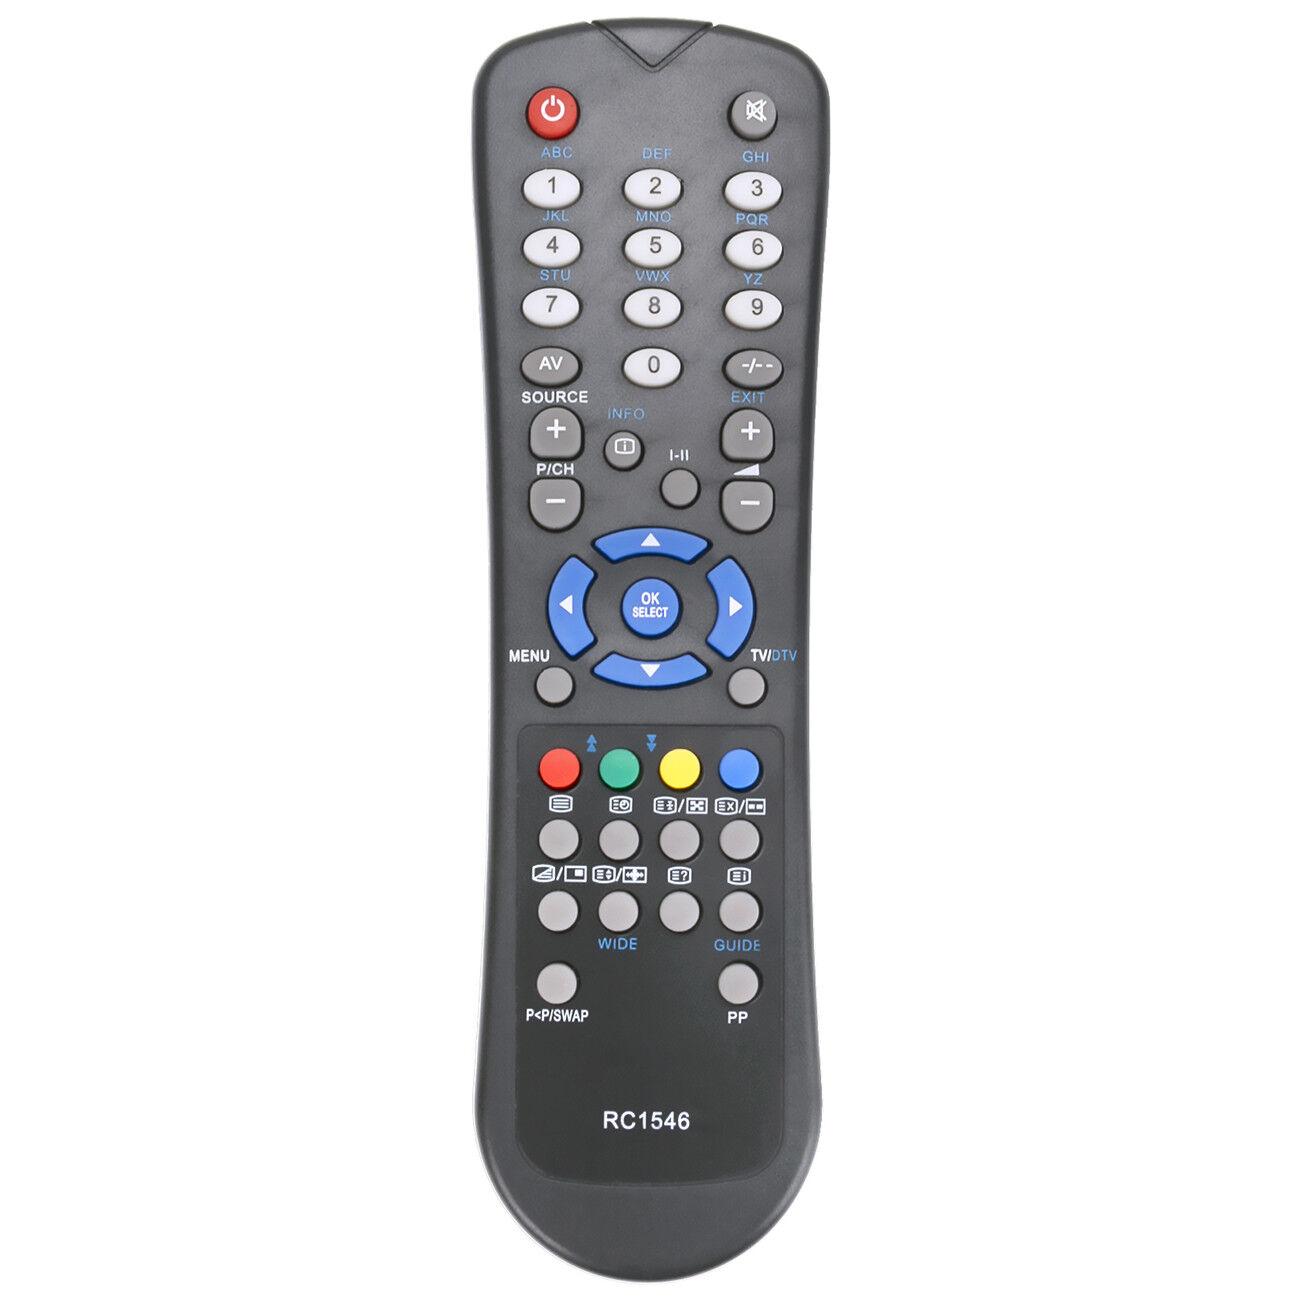 Nuovo telecomando sostitutivo RC1546 per GOODMANS GLCD32WDVBT IDLCD26TV22HD